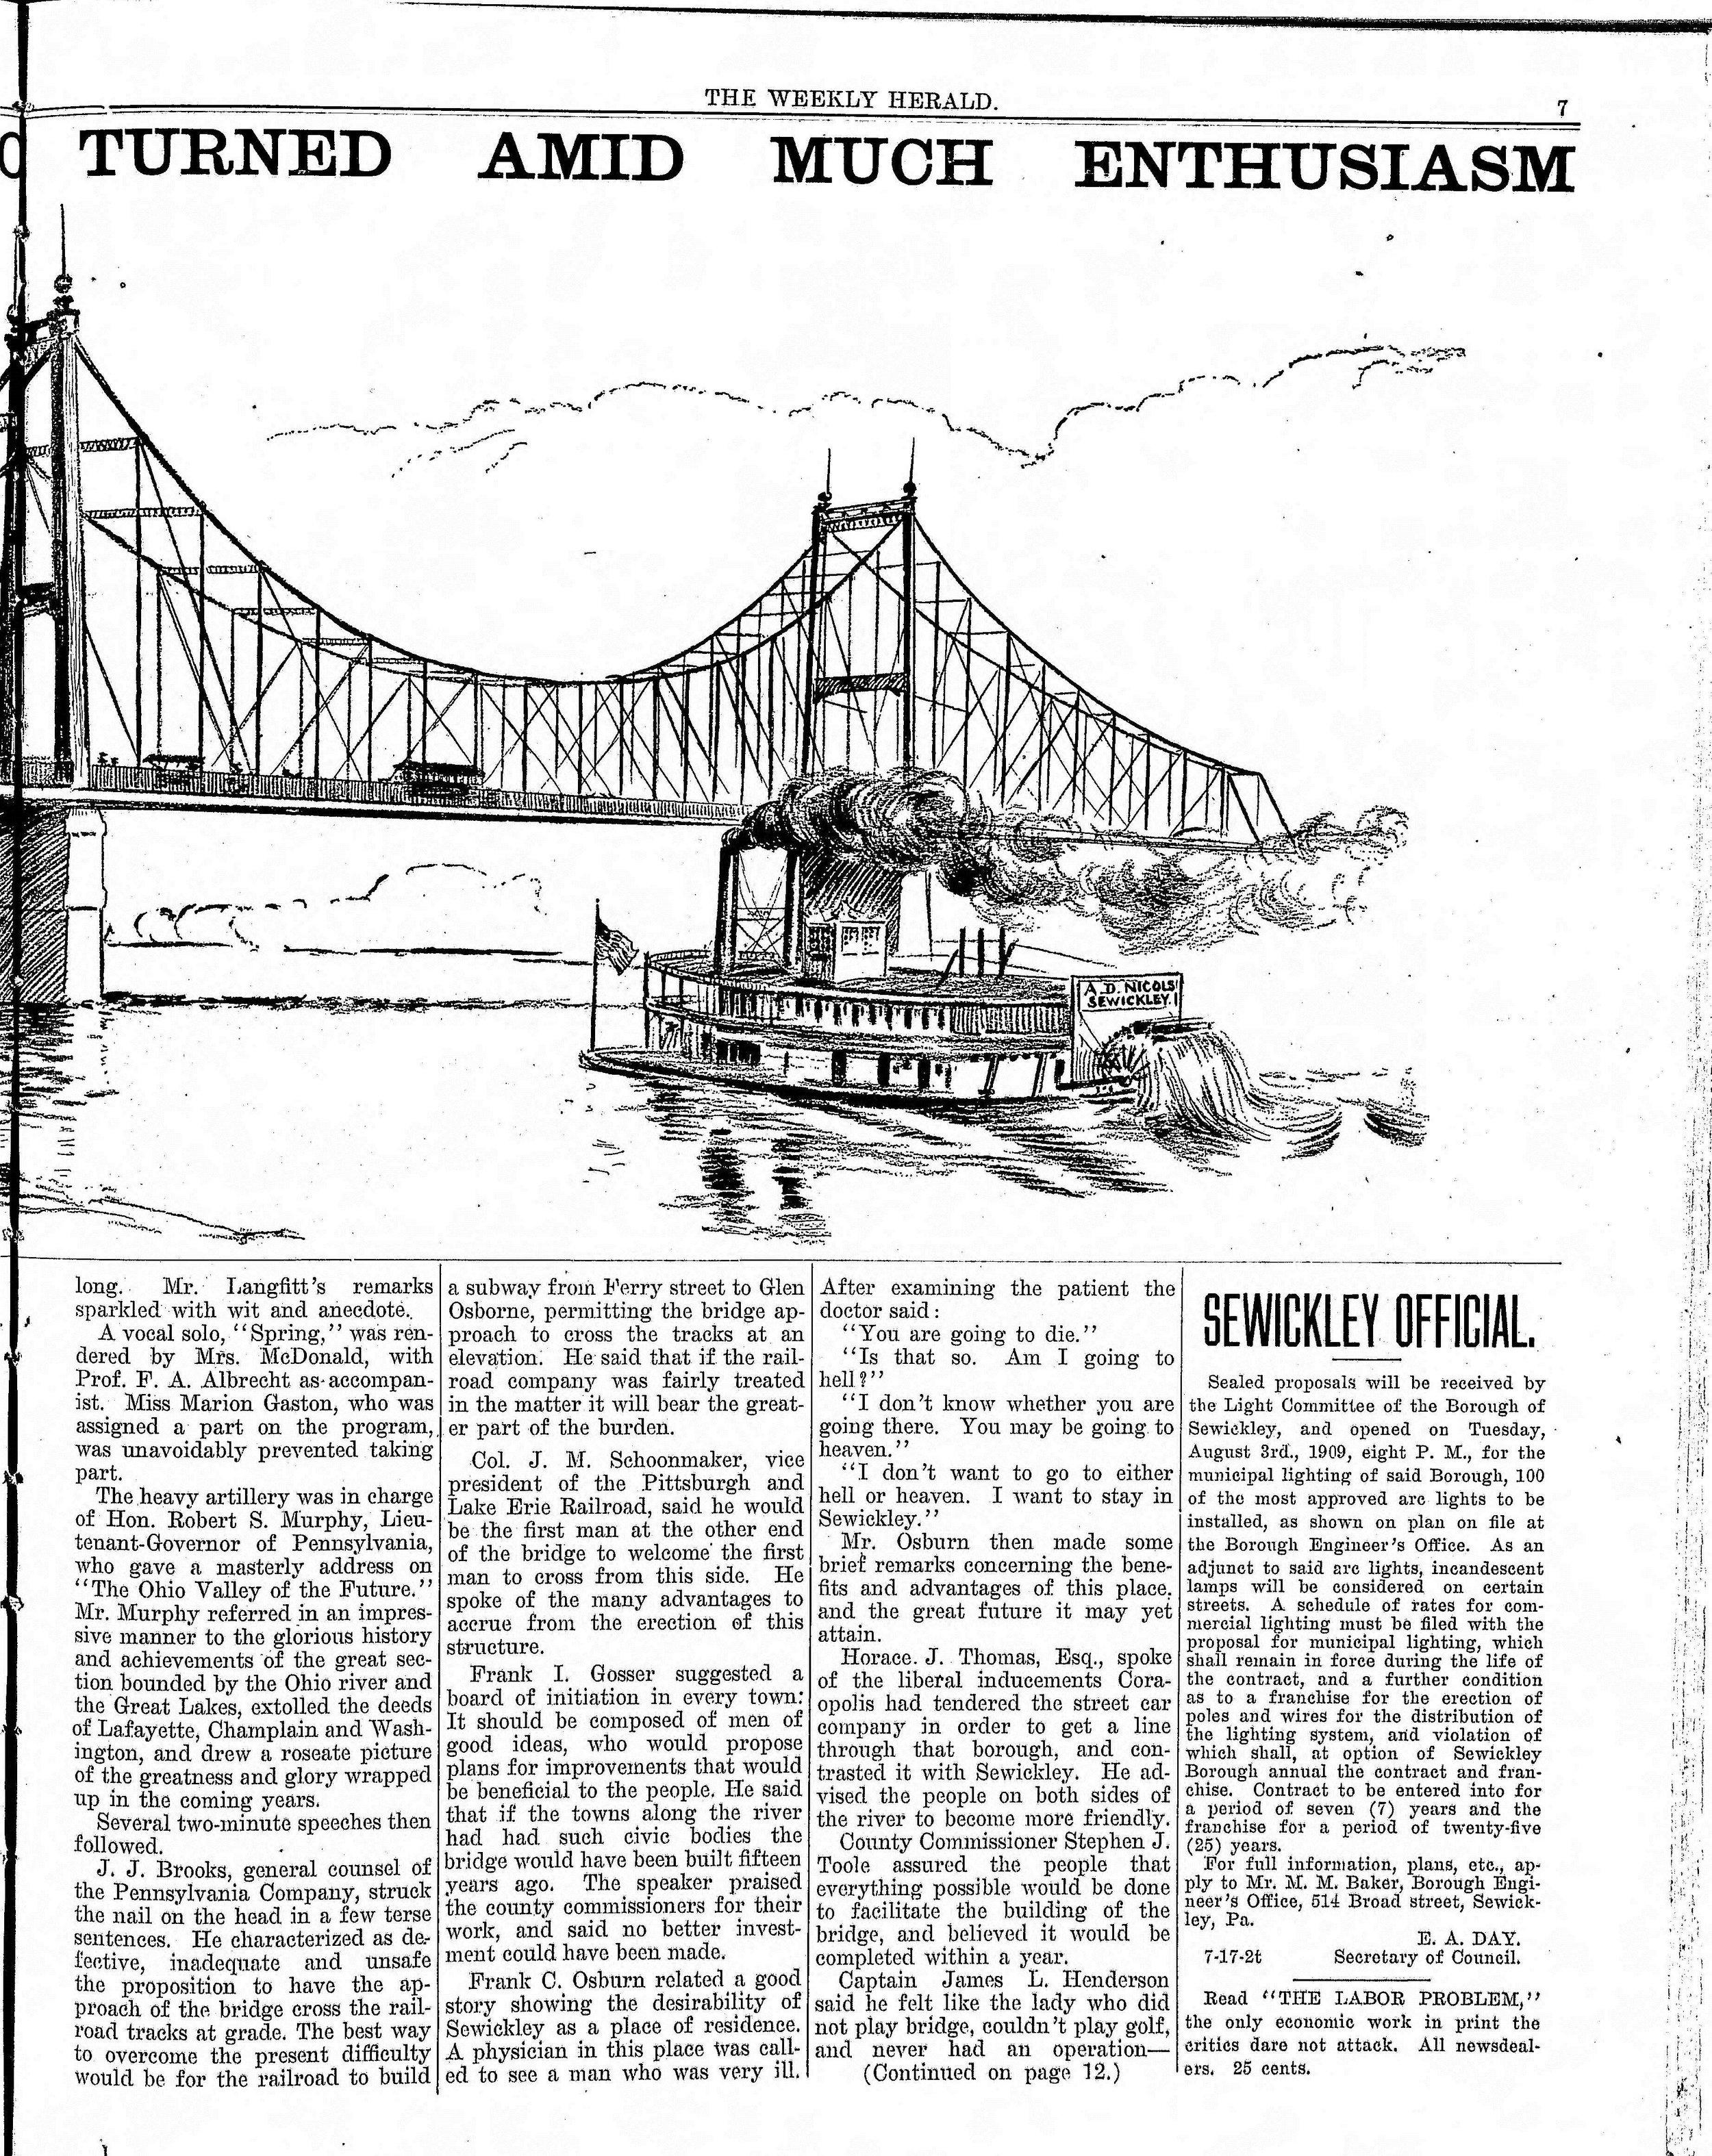 1909-07-24 The Weekly Herald (Sewickley Herald) - Bridge Celebration (pg7).jpg